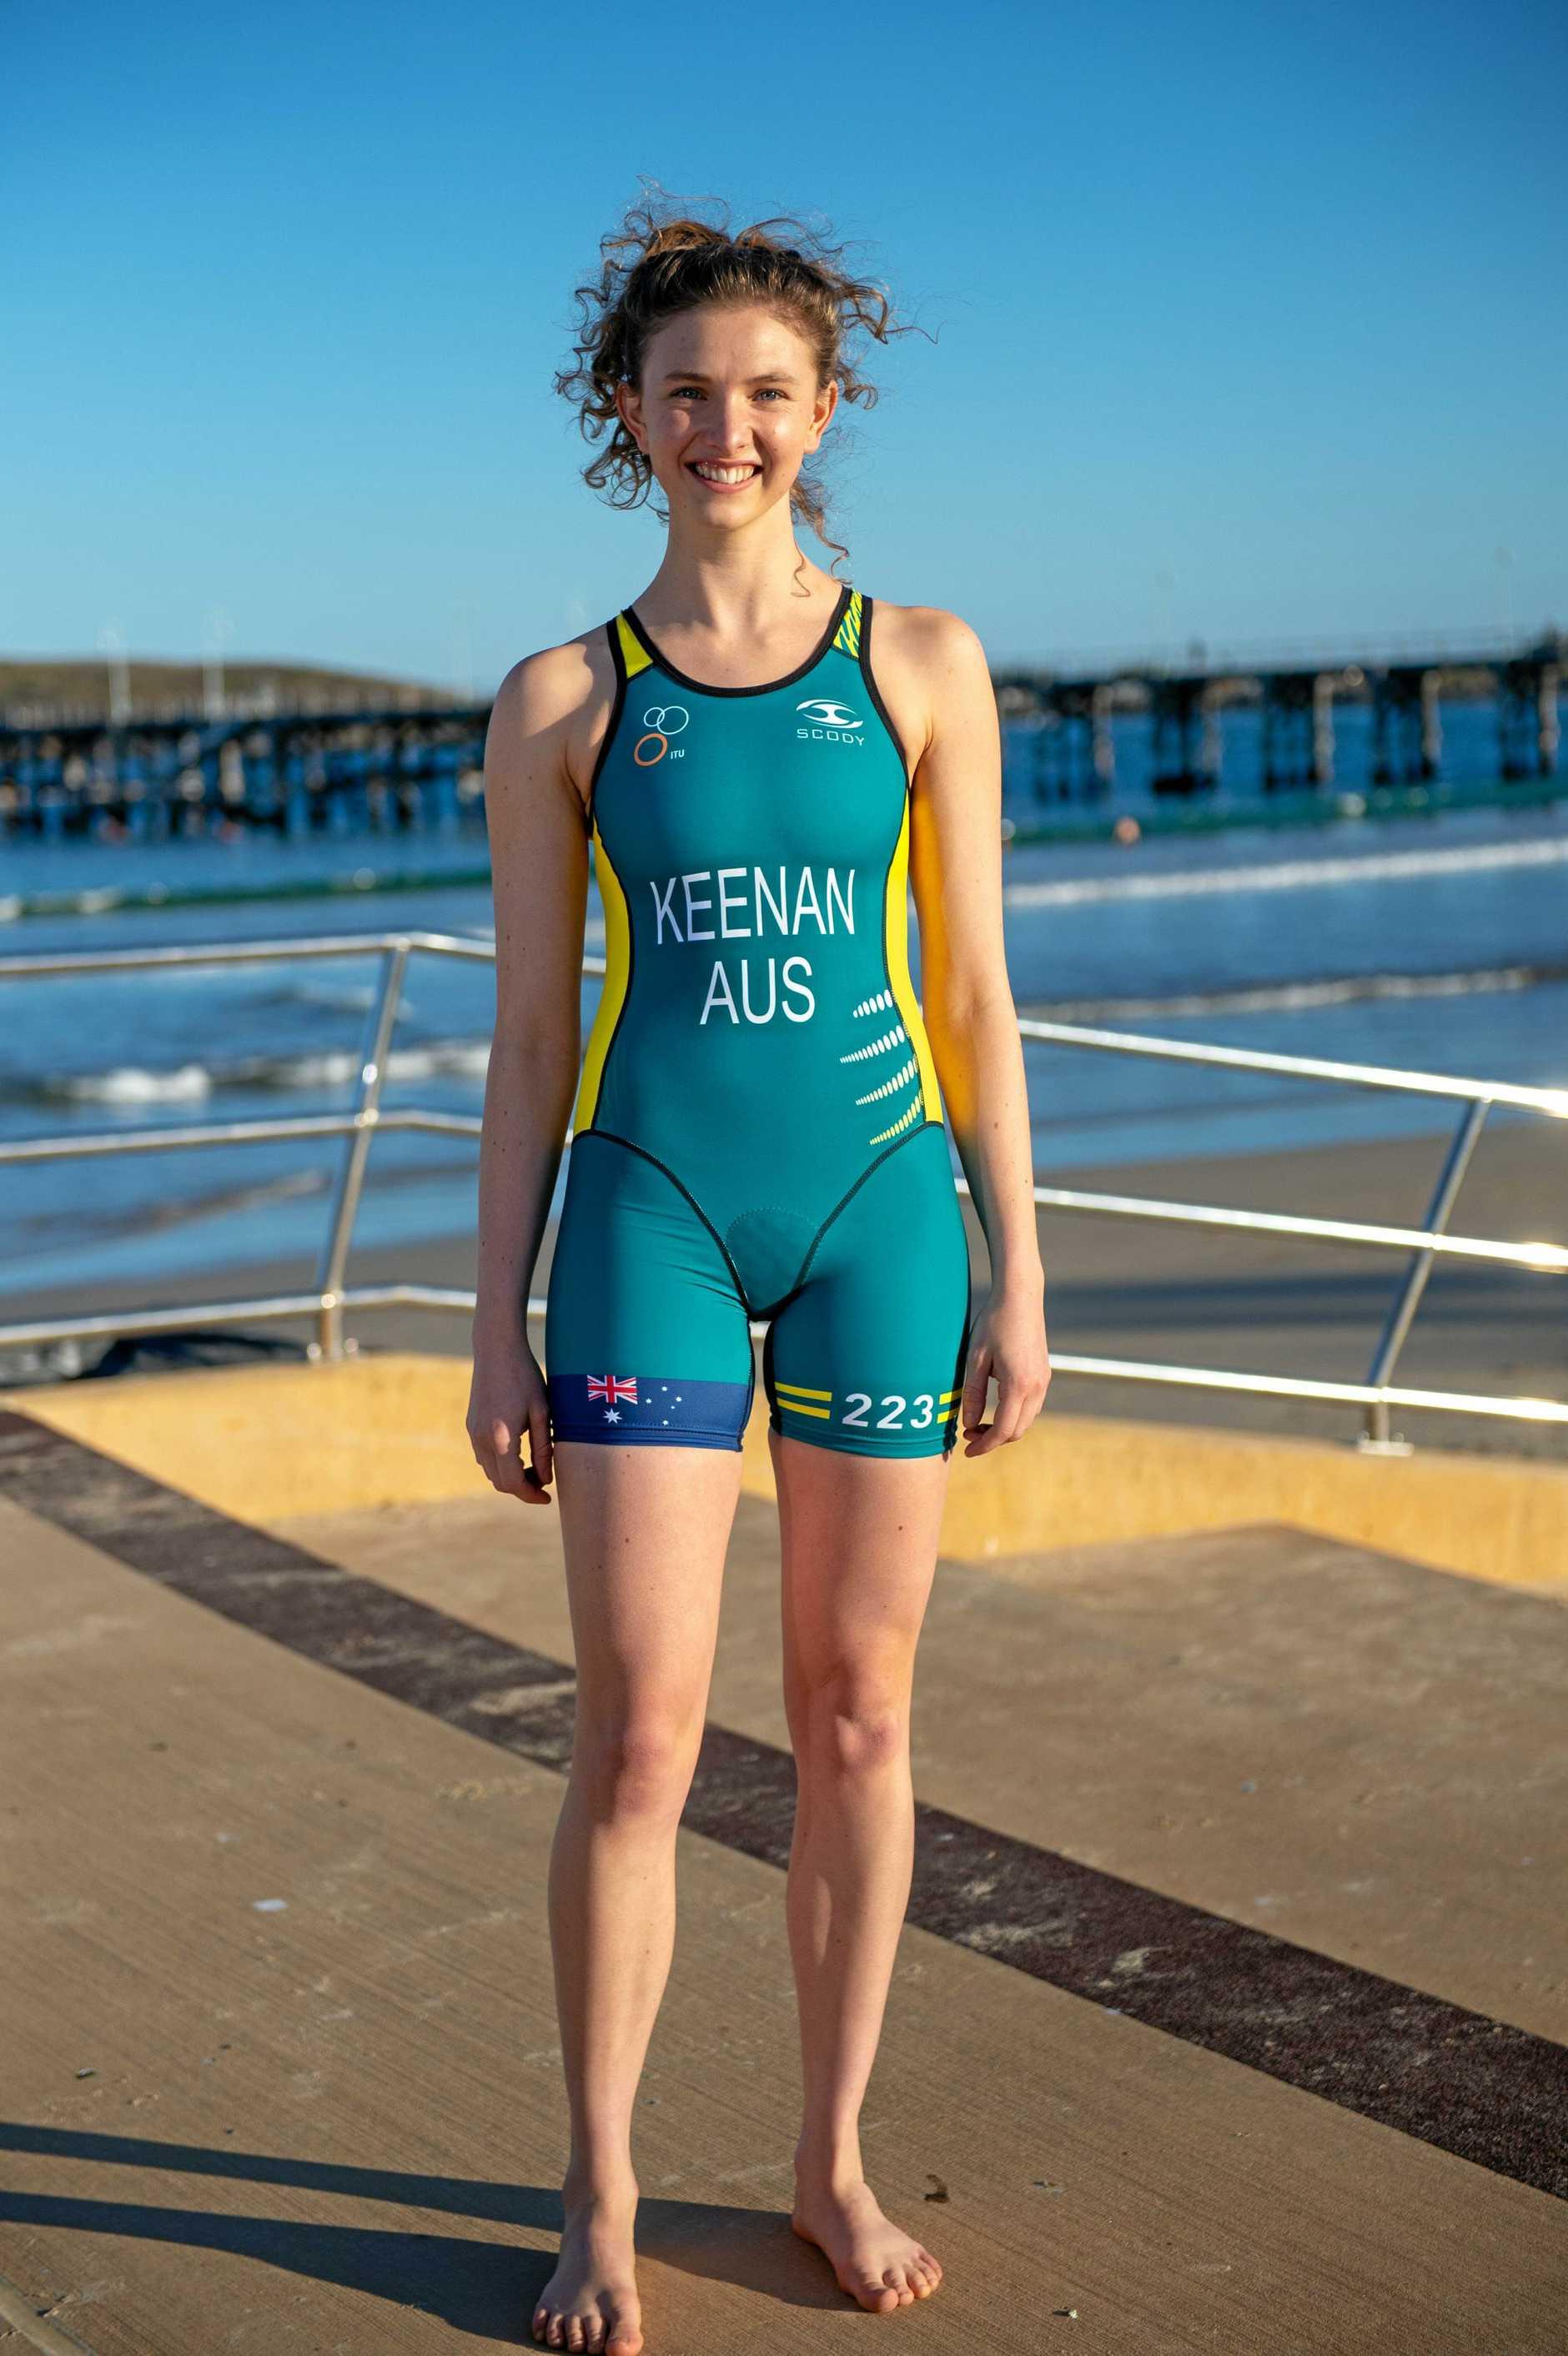 Coffs TRI team heading to Gold Coast for world titles., Sarah Keenan. 30 AUG 2018